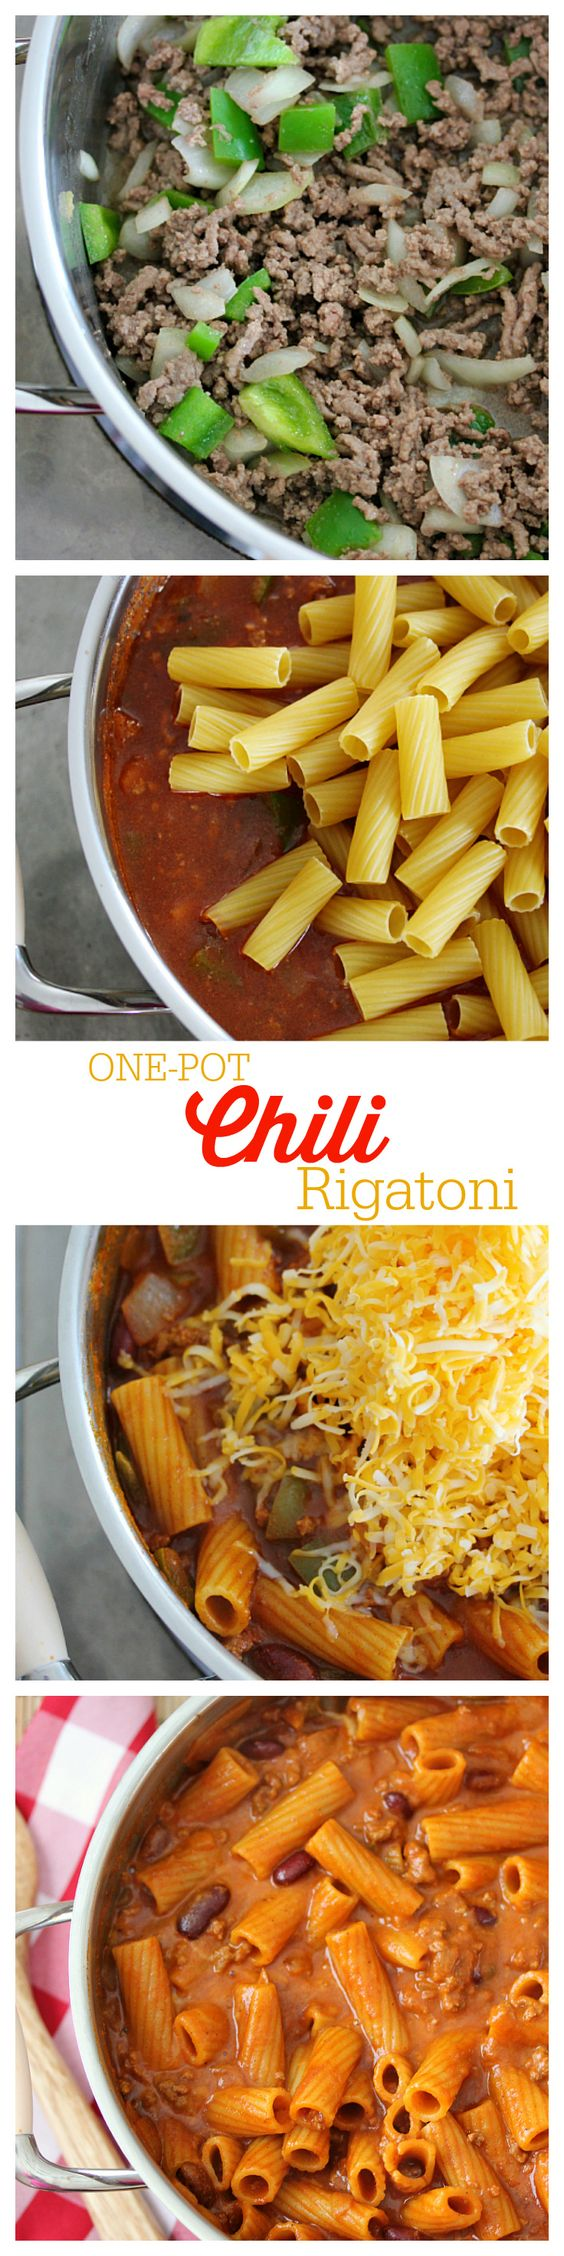 One-Pot Chili Rigatoni